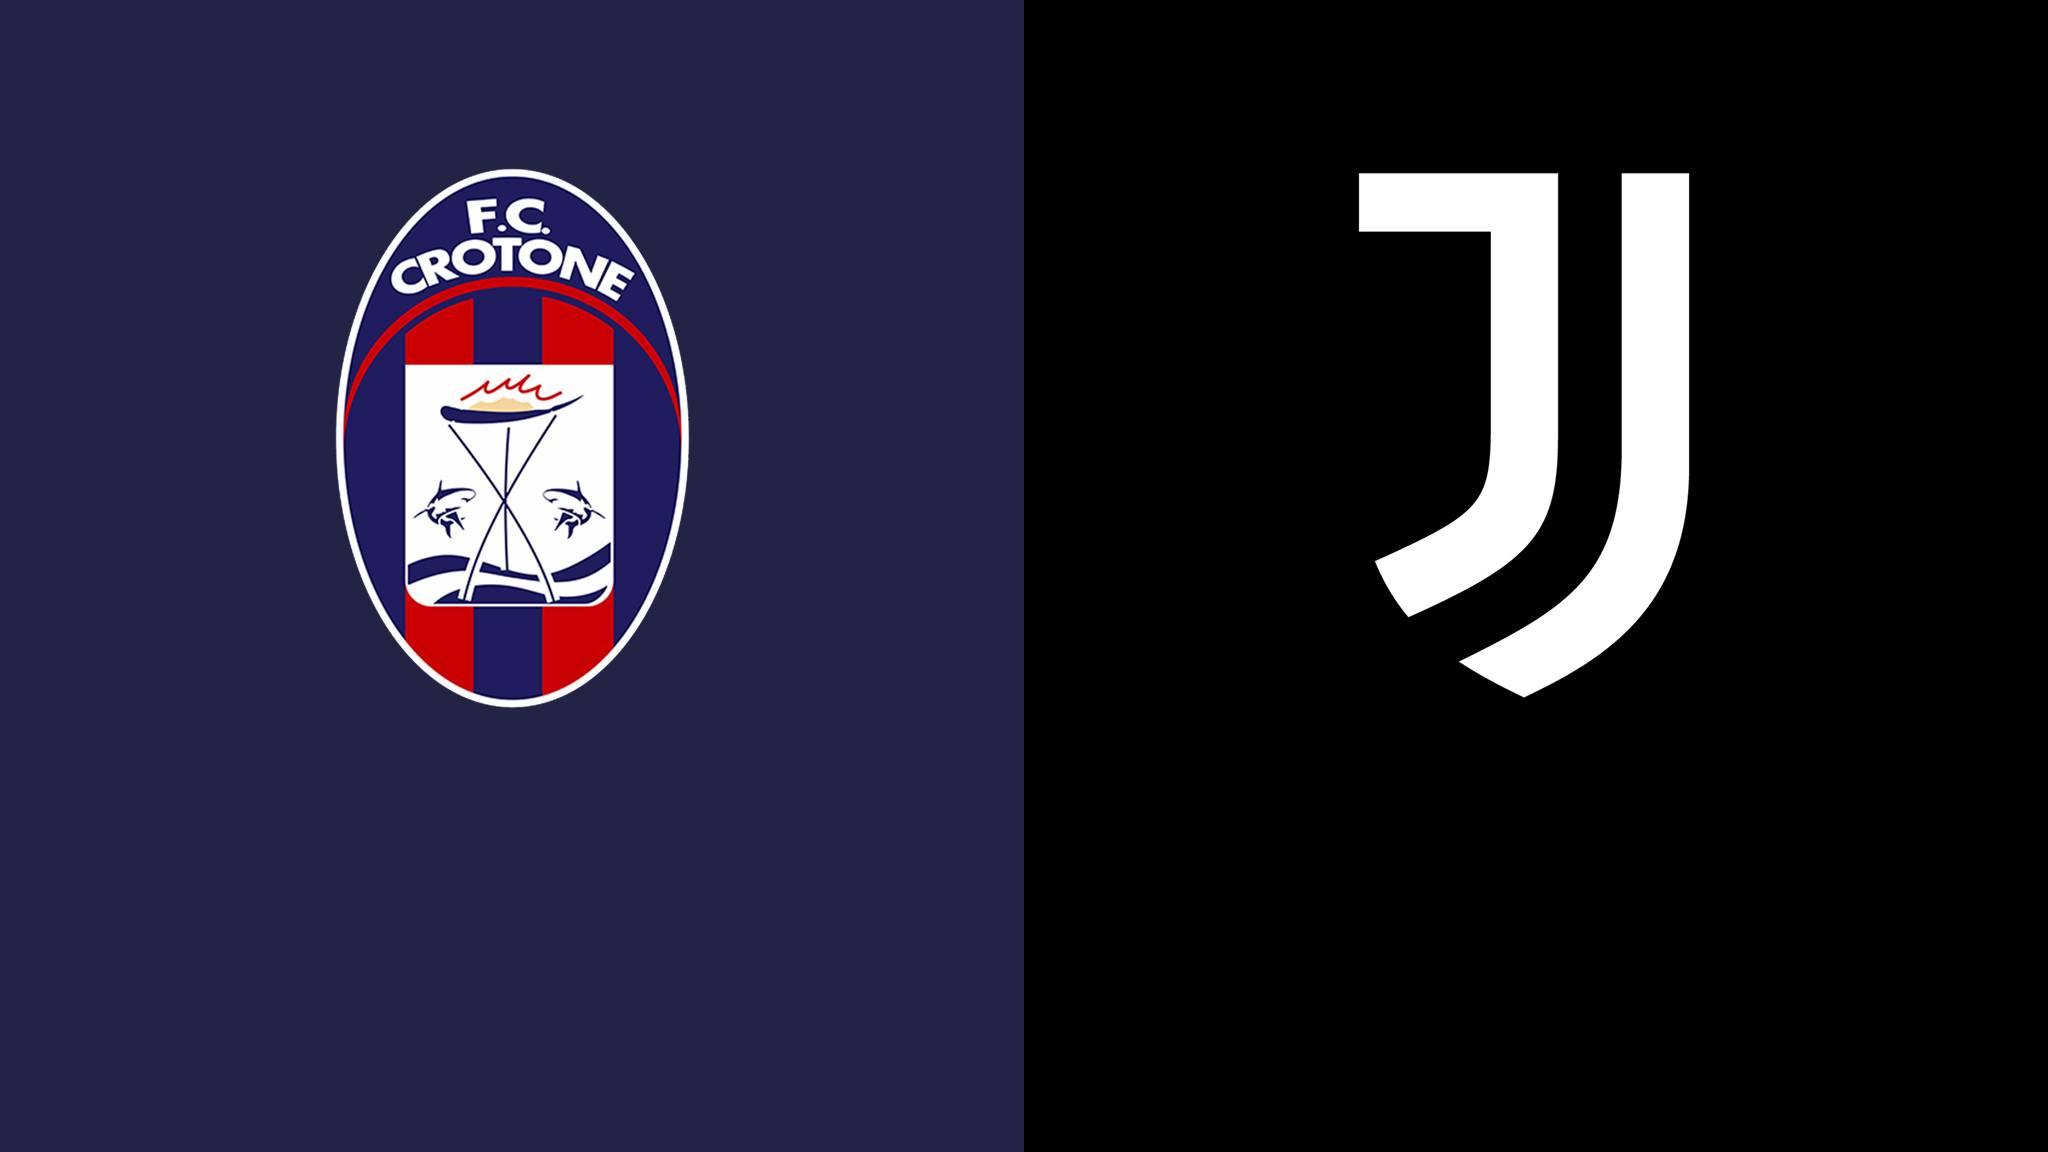 Crotone - Juventus in Diretta Streaming | Abbonati a 9,99€/mese | DAZN IT